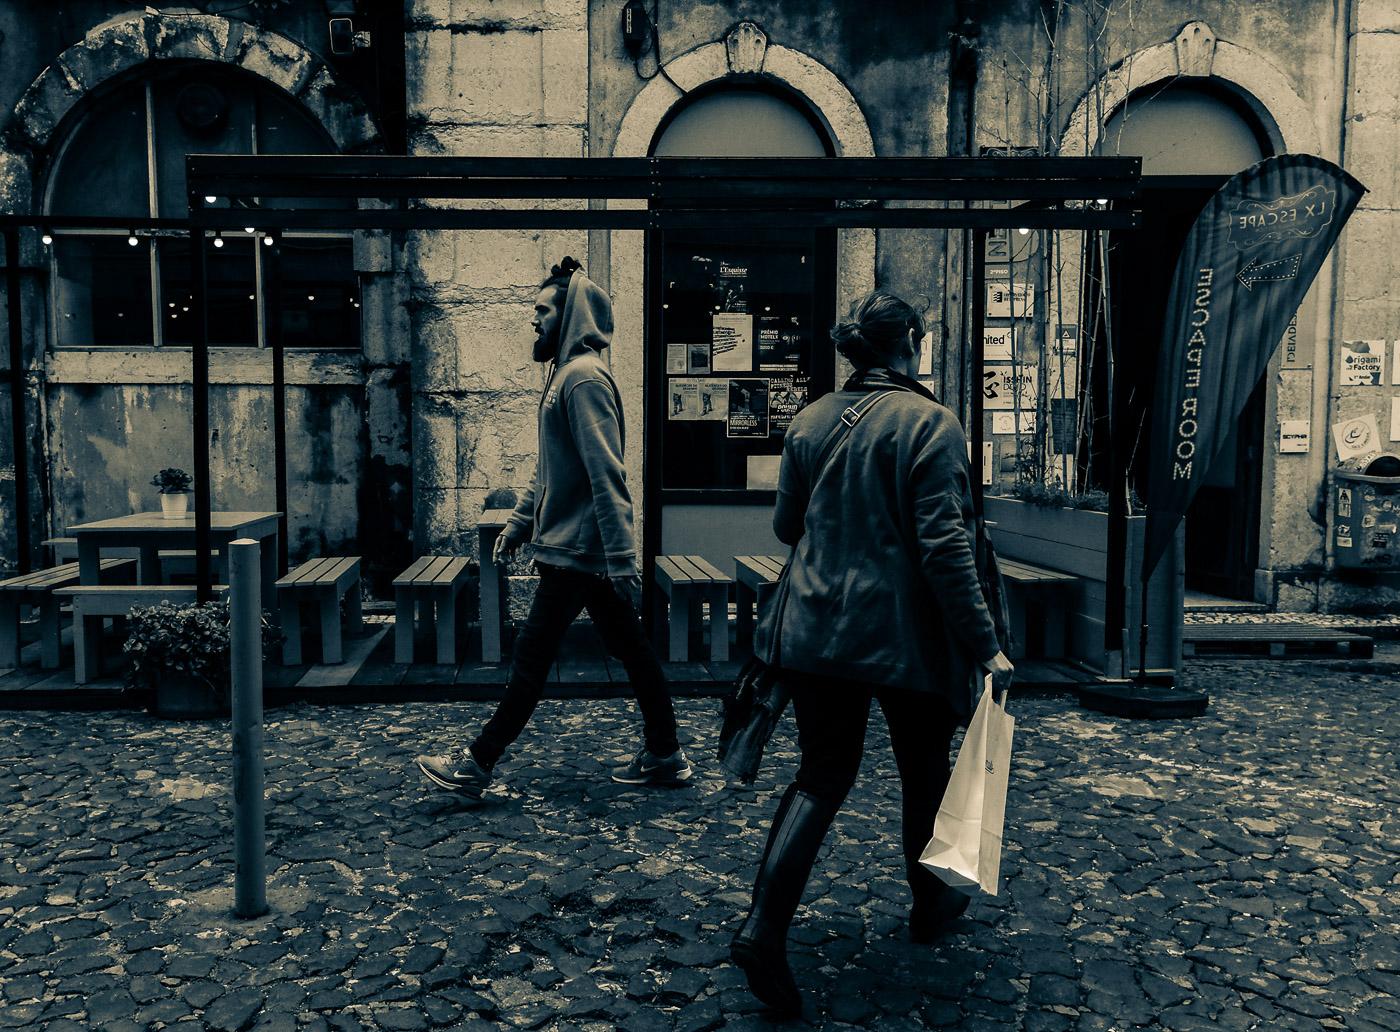 hb images - Lisboa - last day - 11